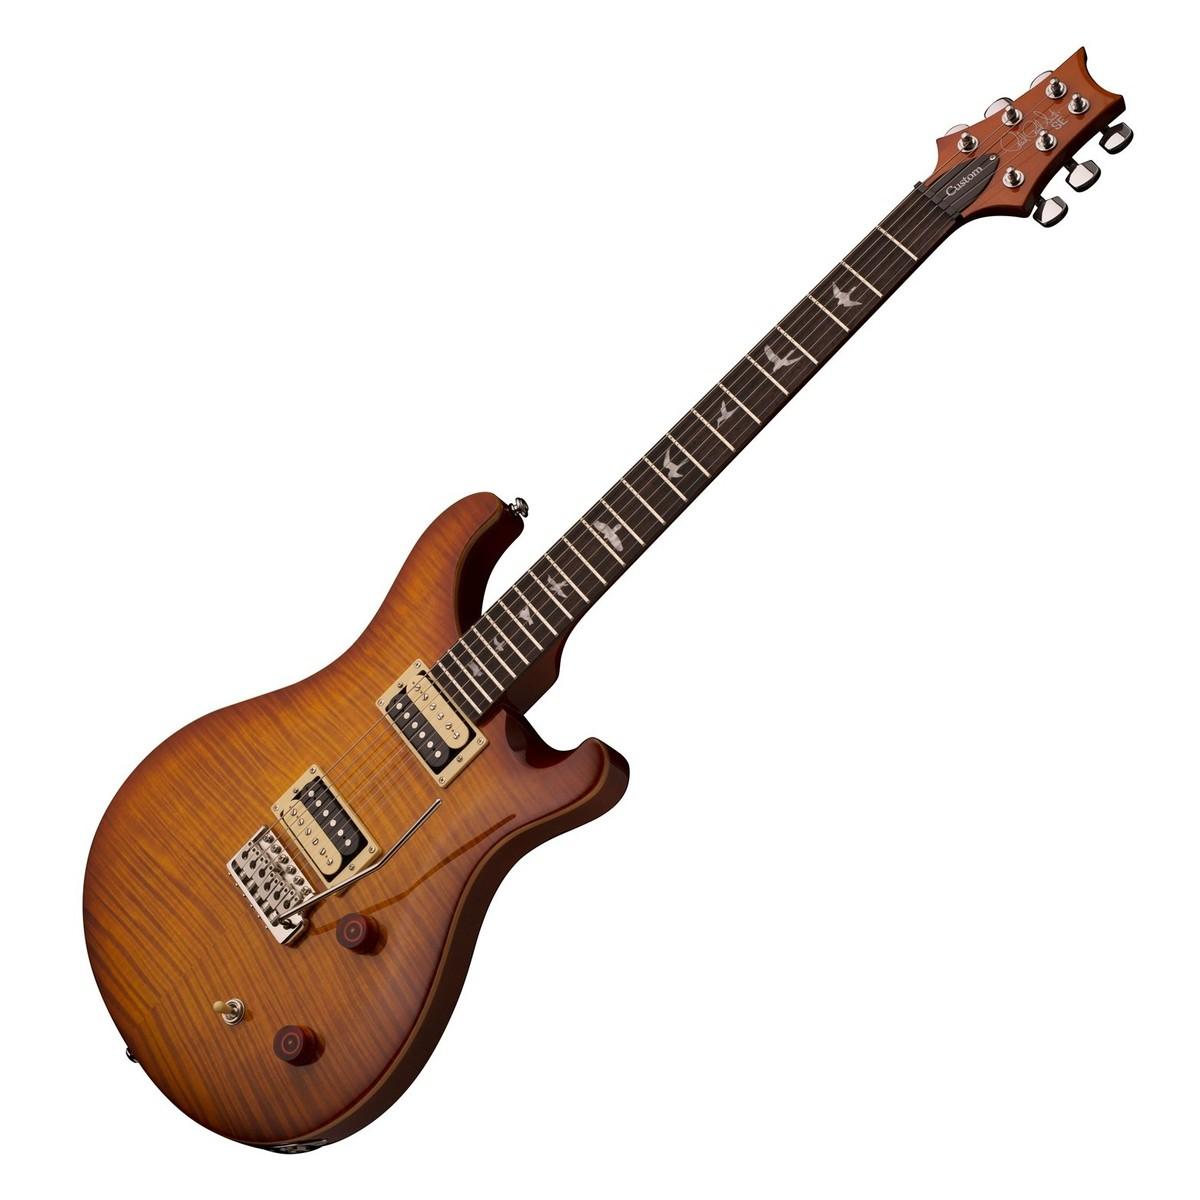 disc prs se custom 22 electric guitar with tremolo vintage sunburst at gear4music. Black Bedroom Furniture Sets. Home Design Ideas